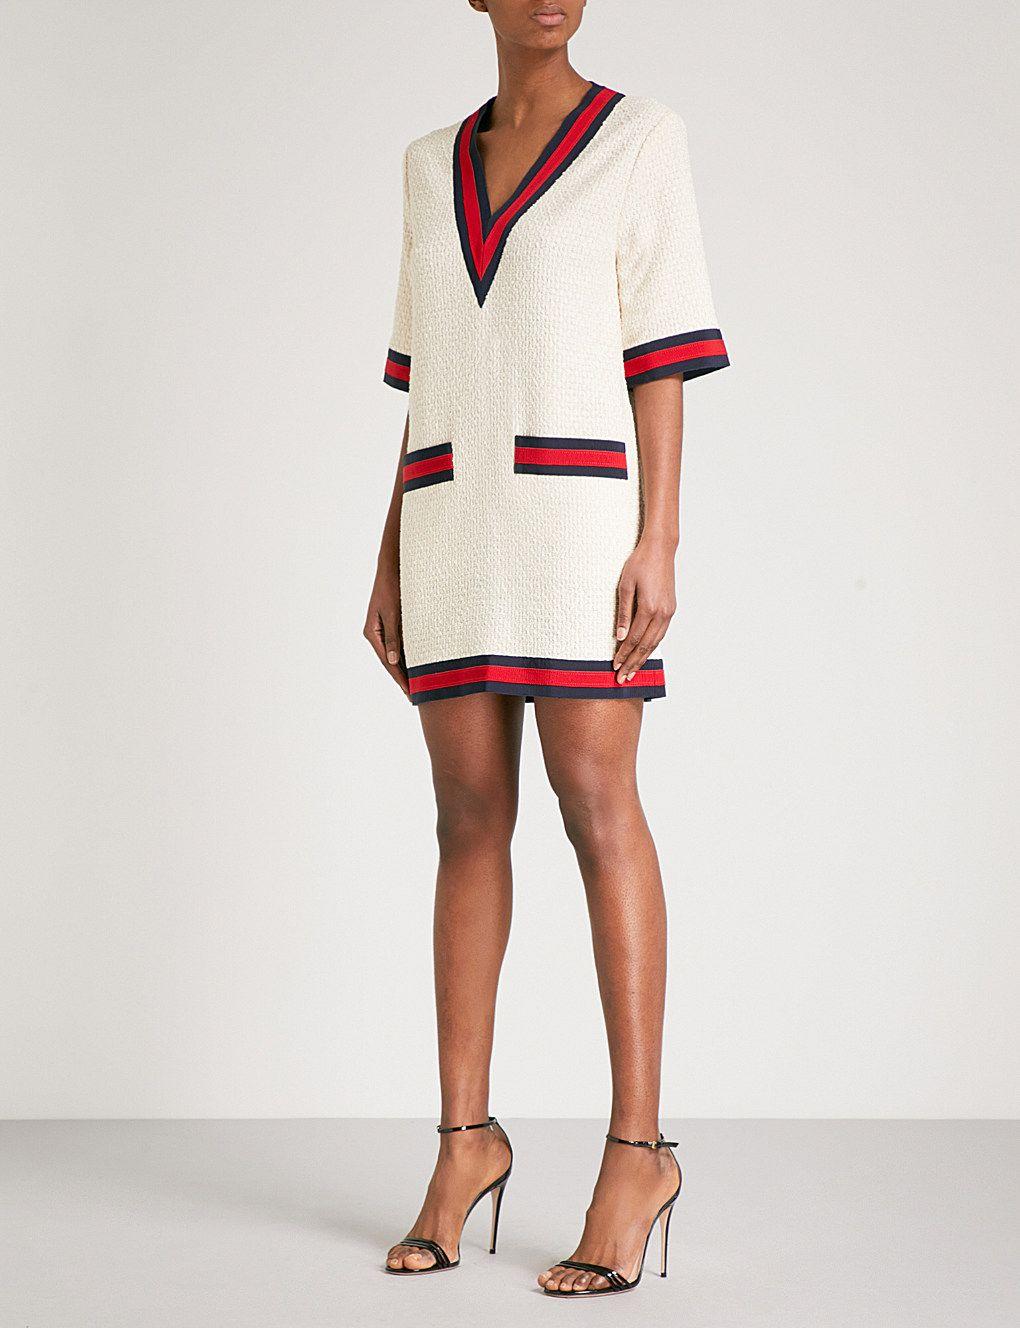 designer t shirt dress